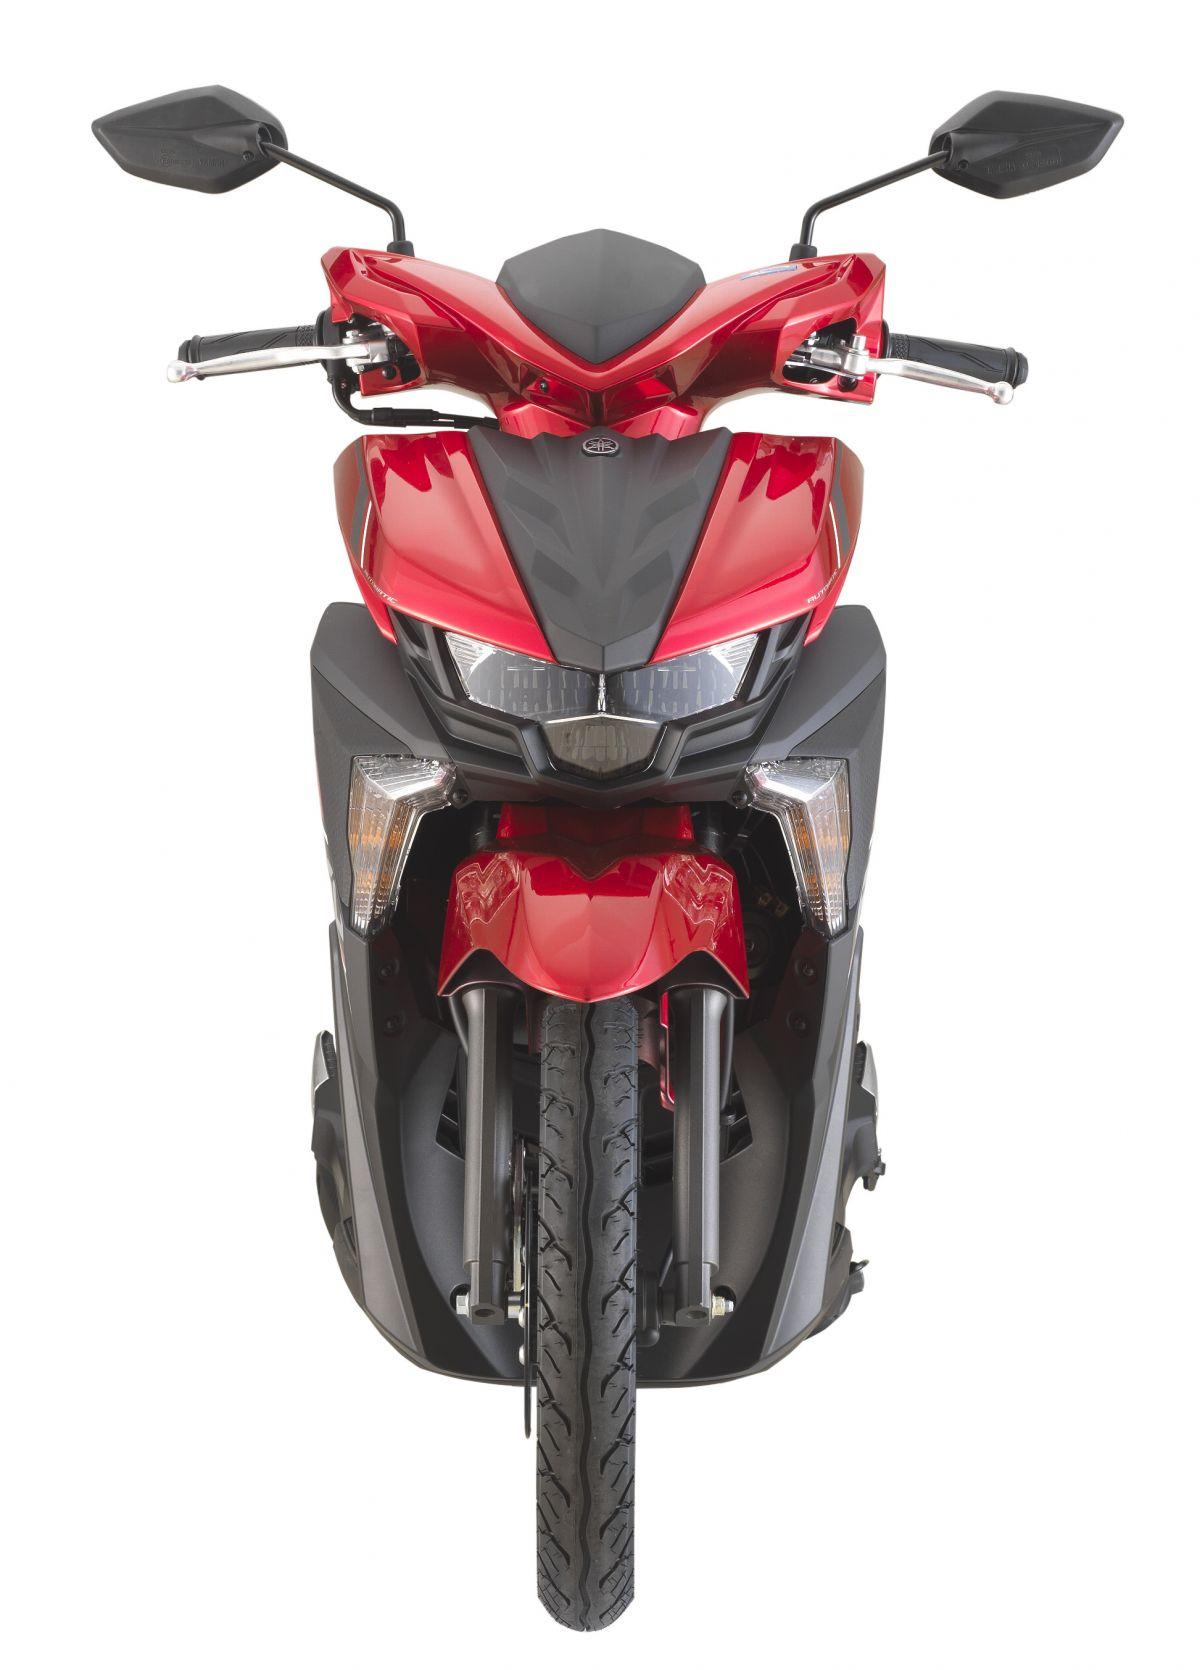 Spesifikasi Yamaha Ego Avantiz 2020